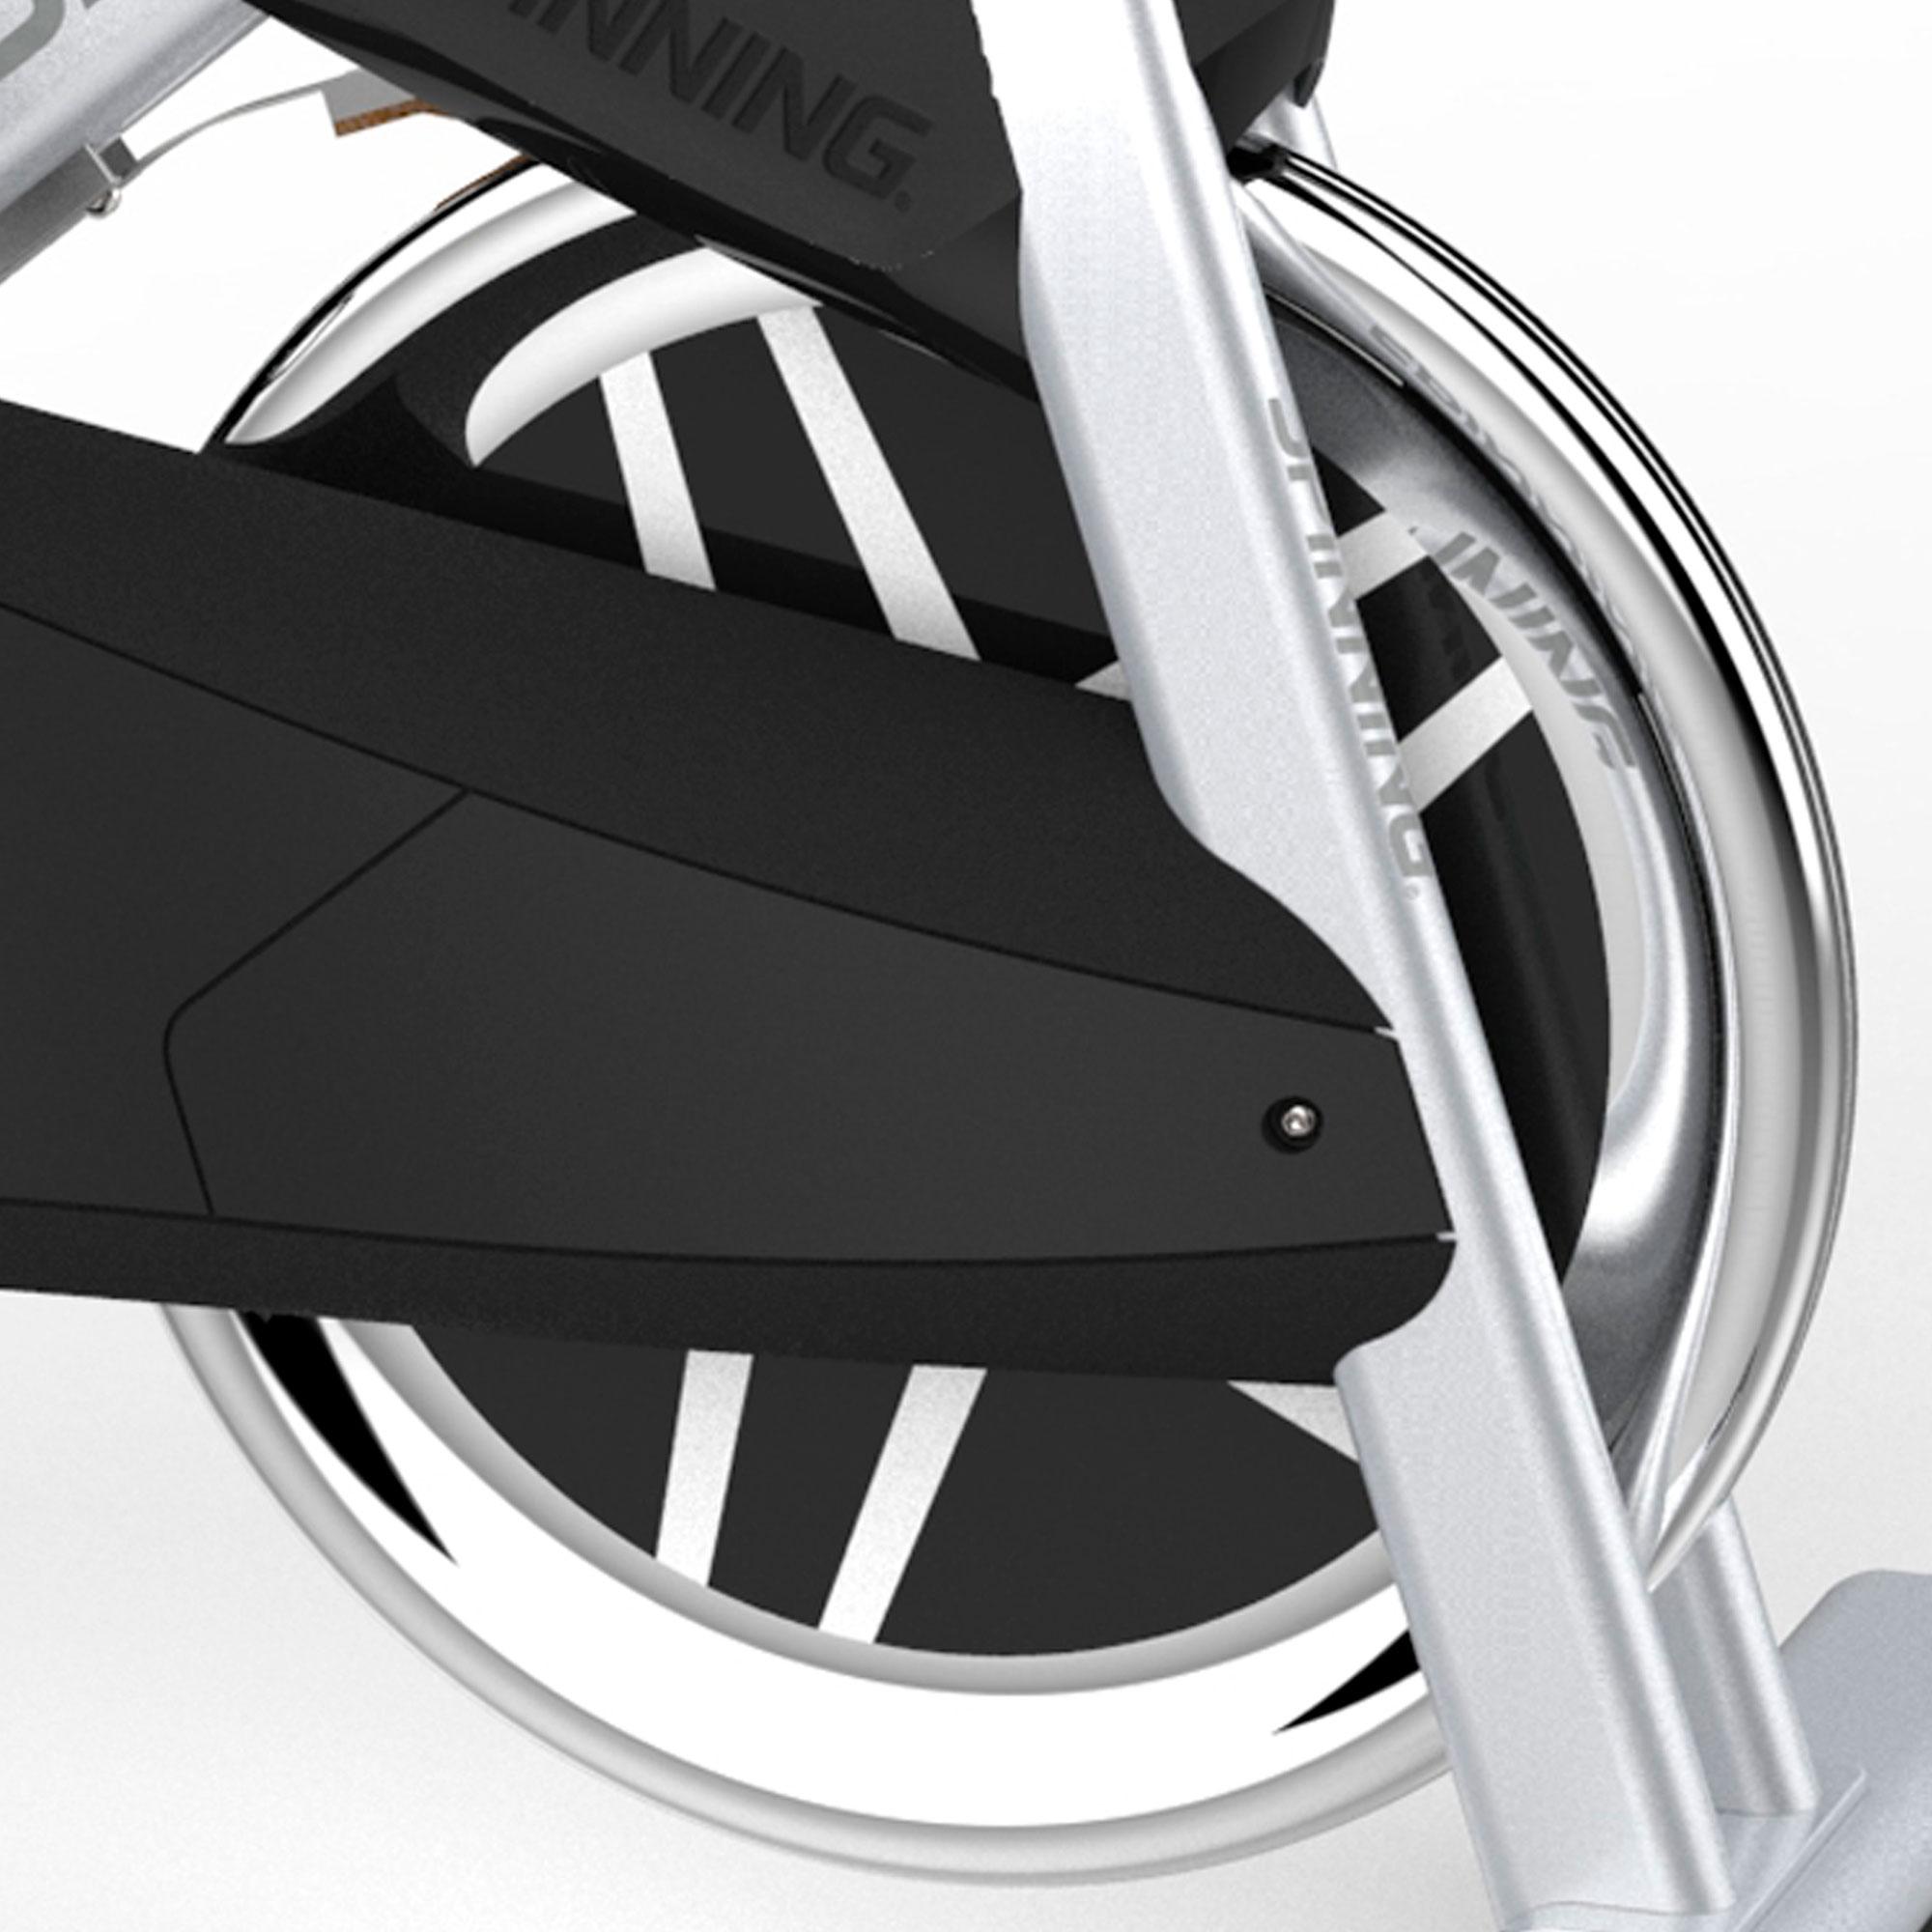 Spinning Spinner® A3 Spin Bike